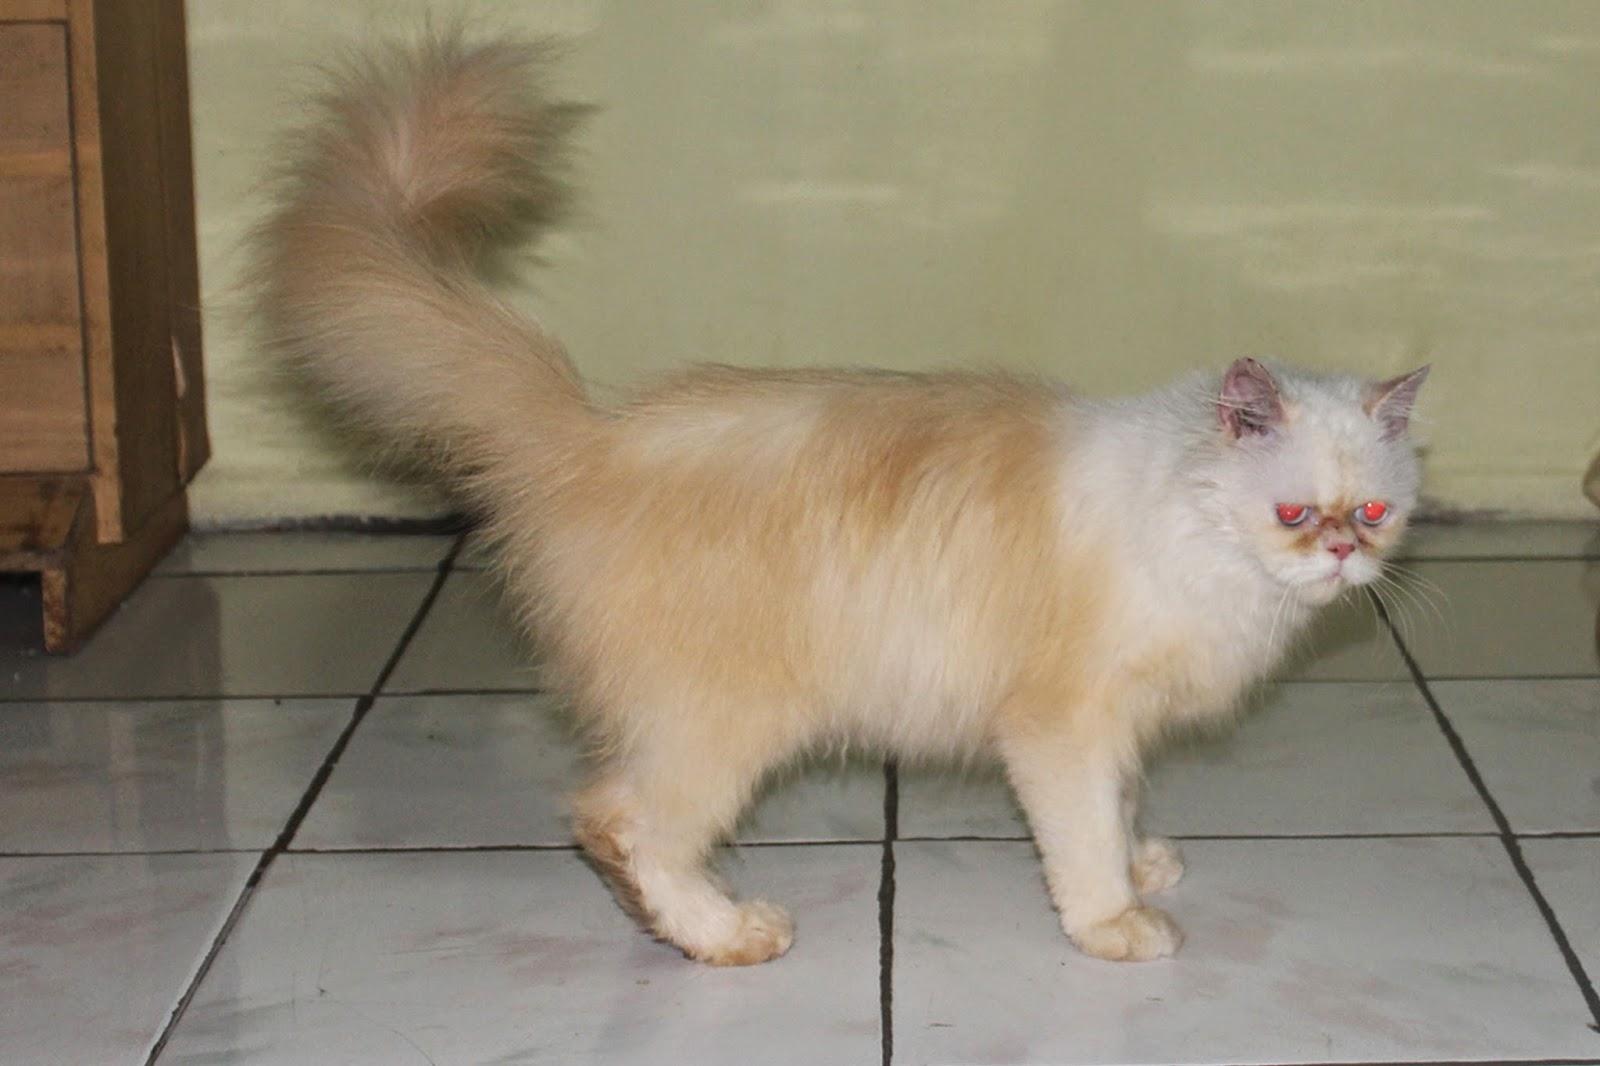 Harga Kucing Peaknose Turun Segitu Petshop